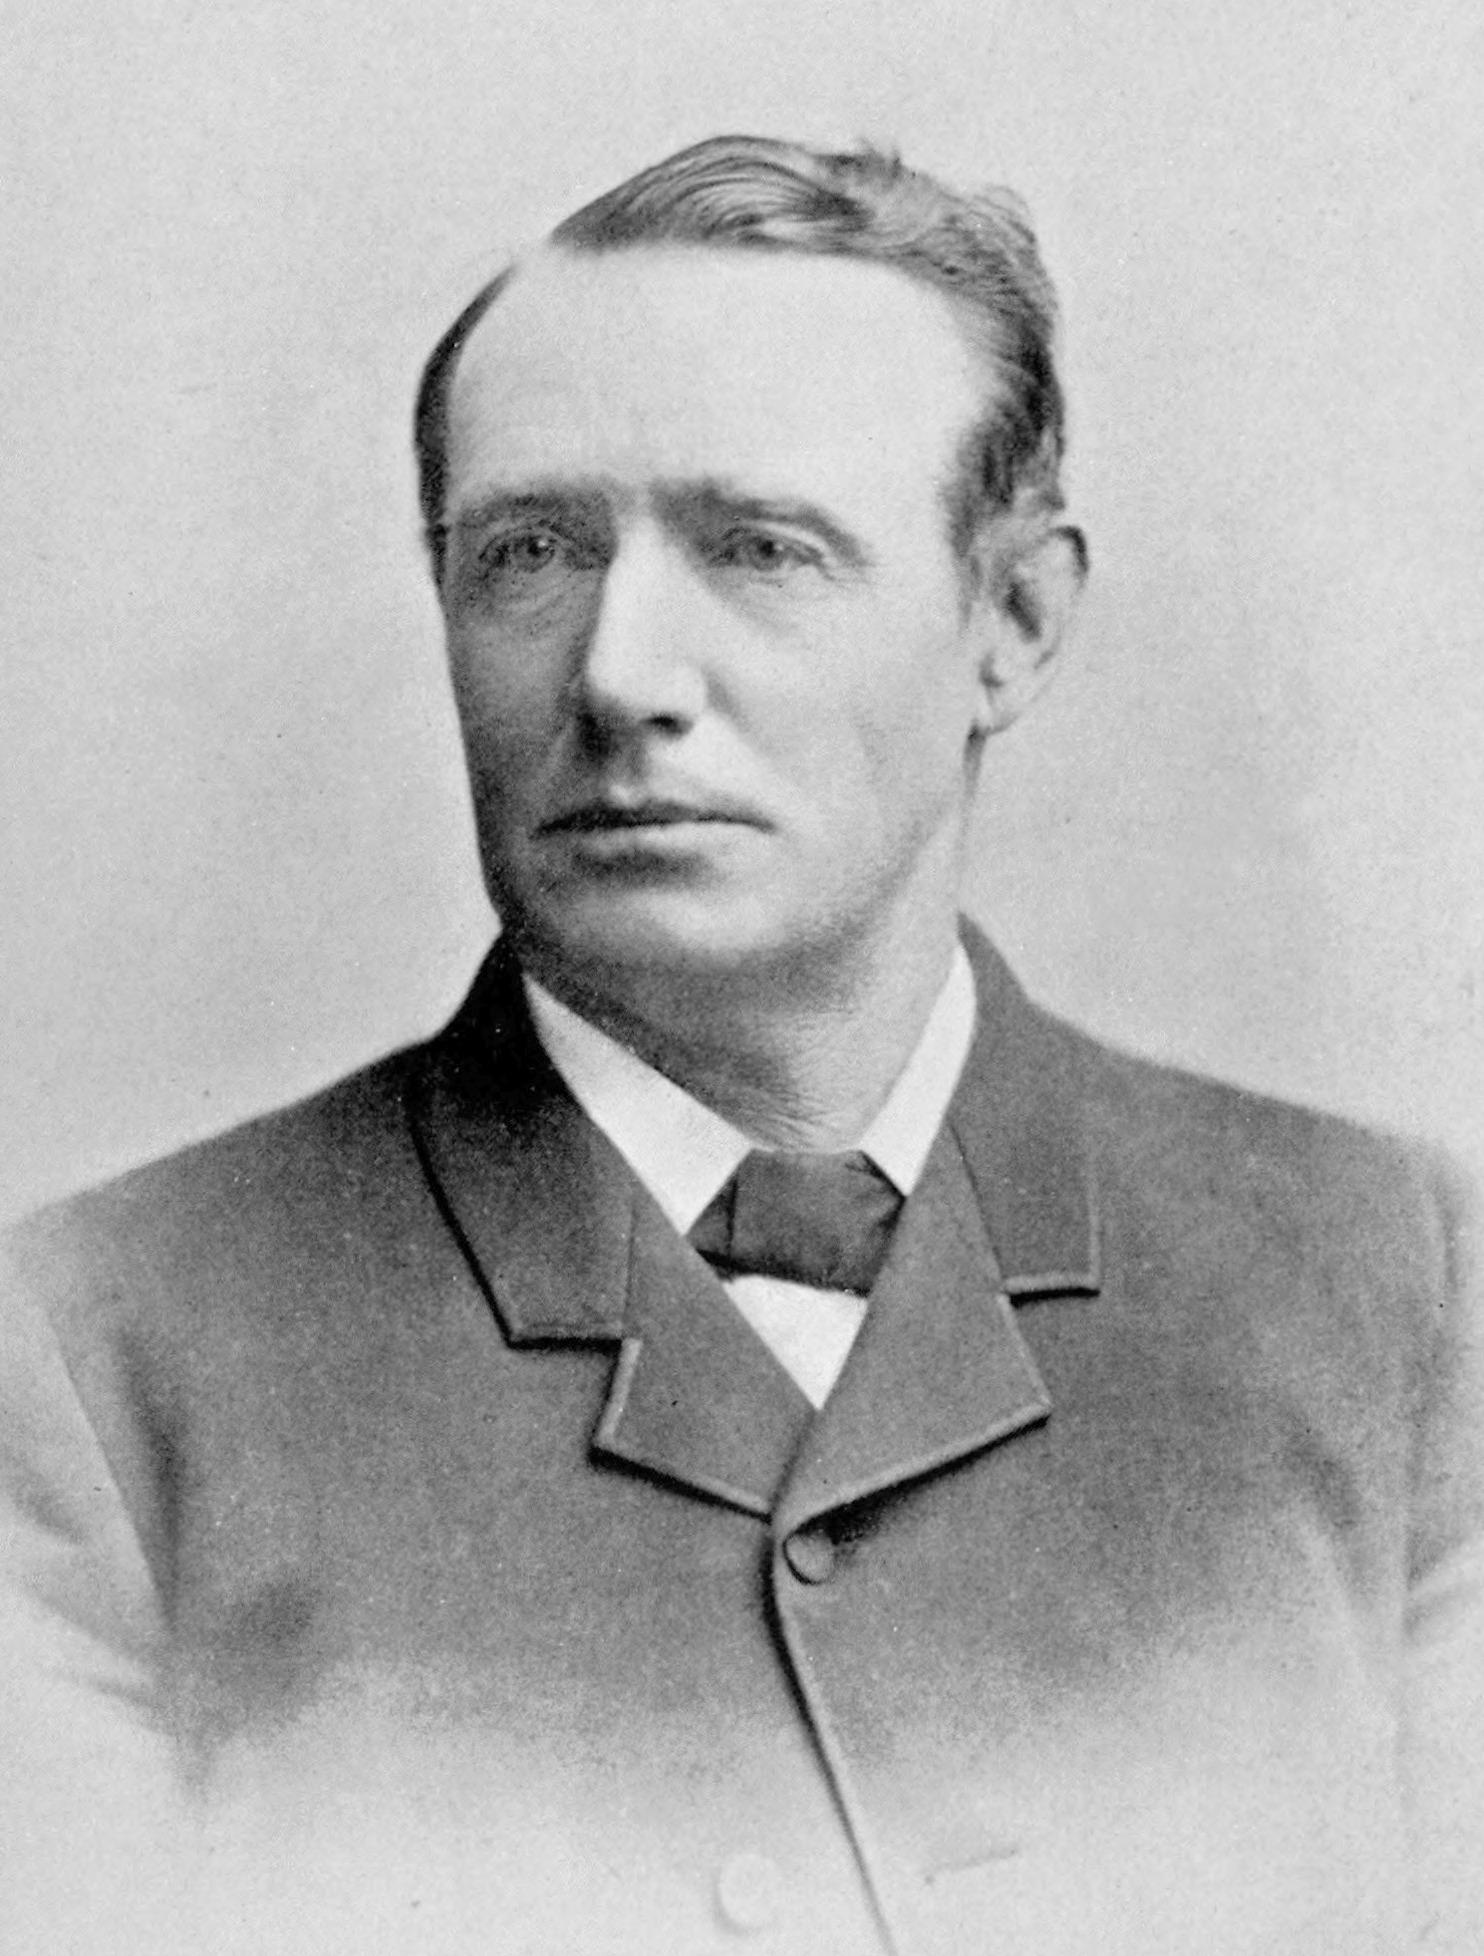 John W . McCormick